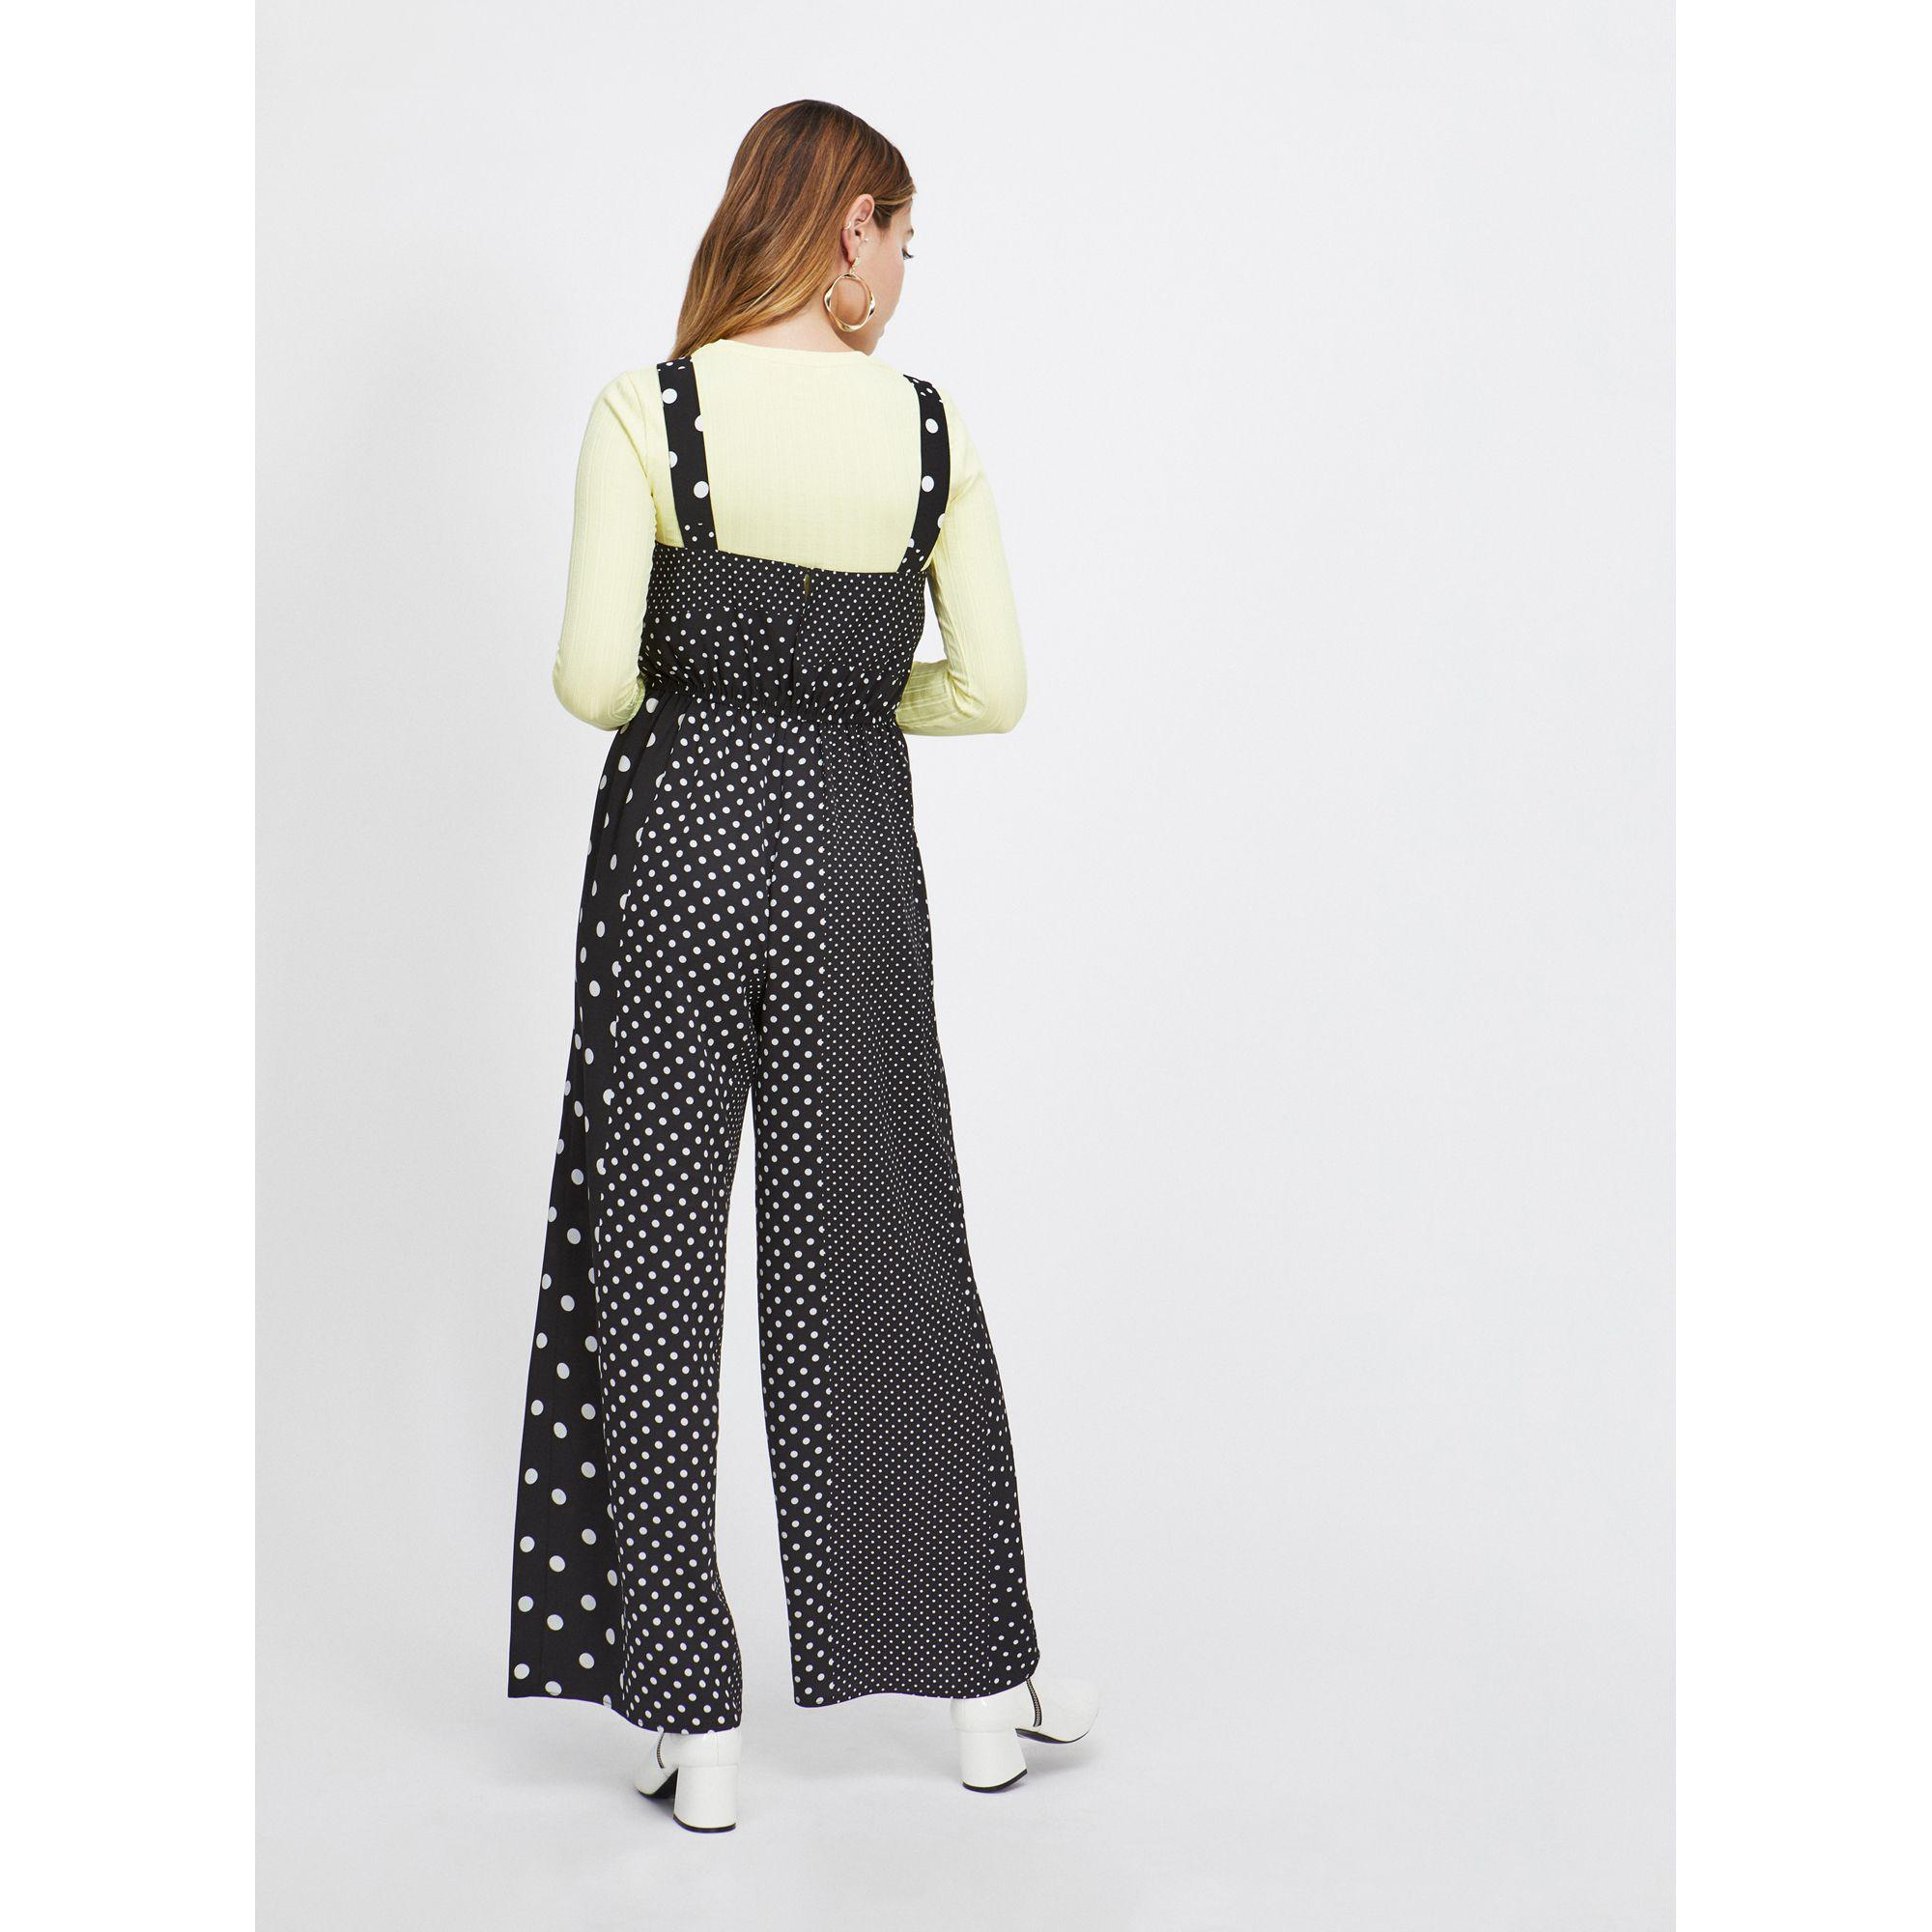 b603b97cb87 Miss Selfridge - Petite Black Spotted Pinafore Jumpsuit - Lyst. View  fullscreen